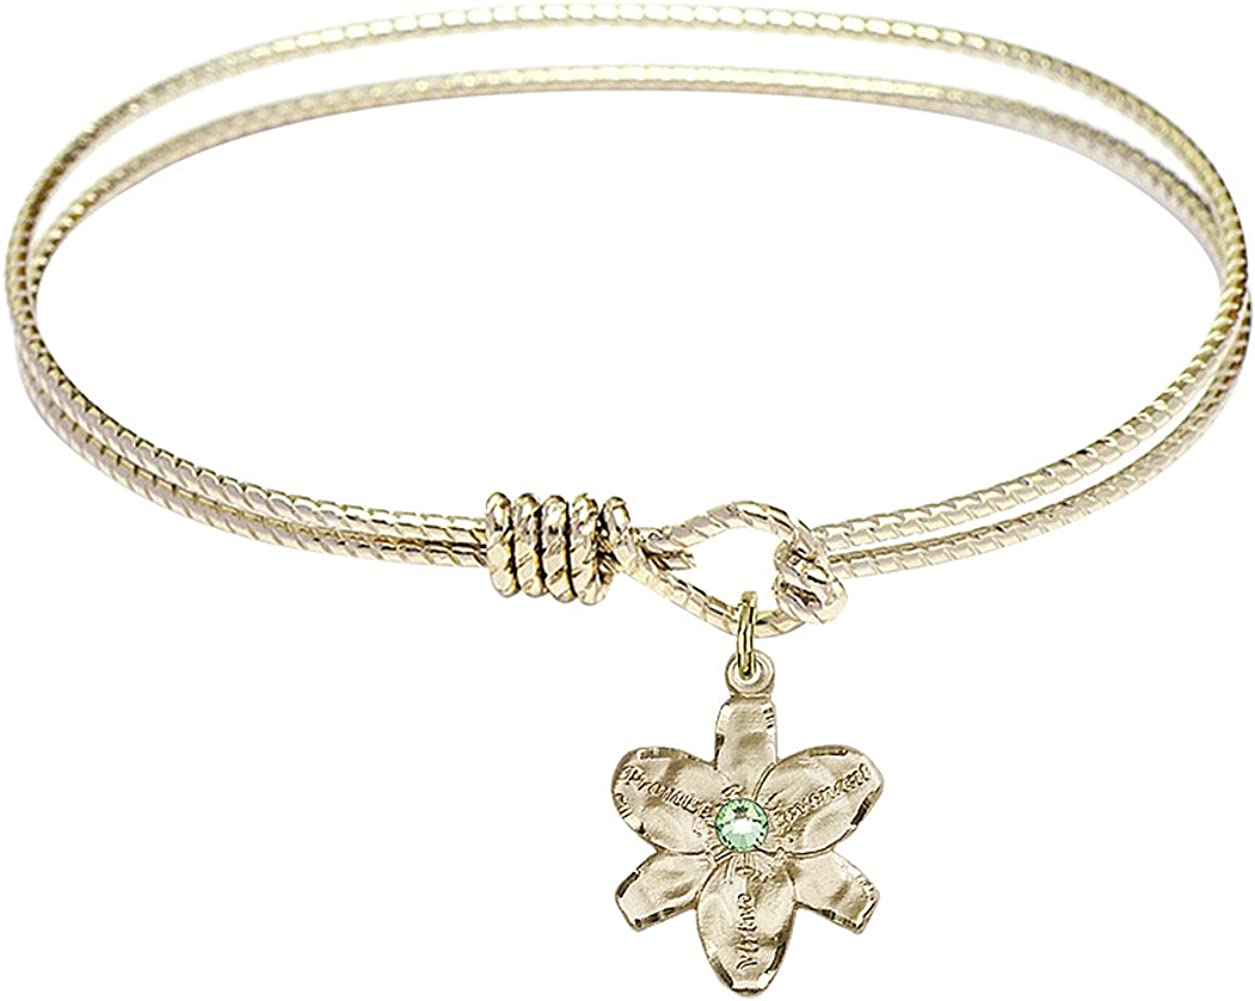 DiamondJewelryNY Eye Hook Bangle Bracelet Chastity with free shipping 40% OFF Cheap Sale a Charm.